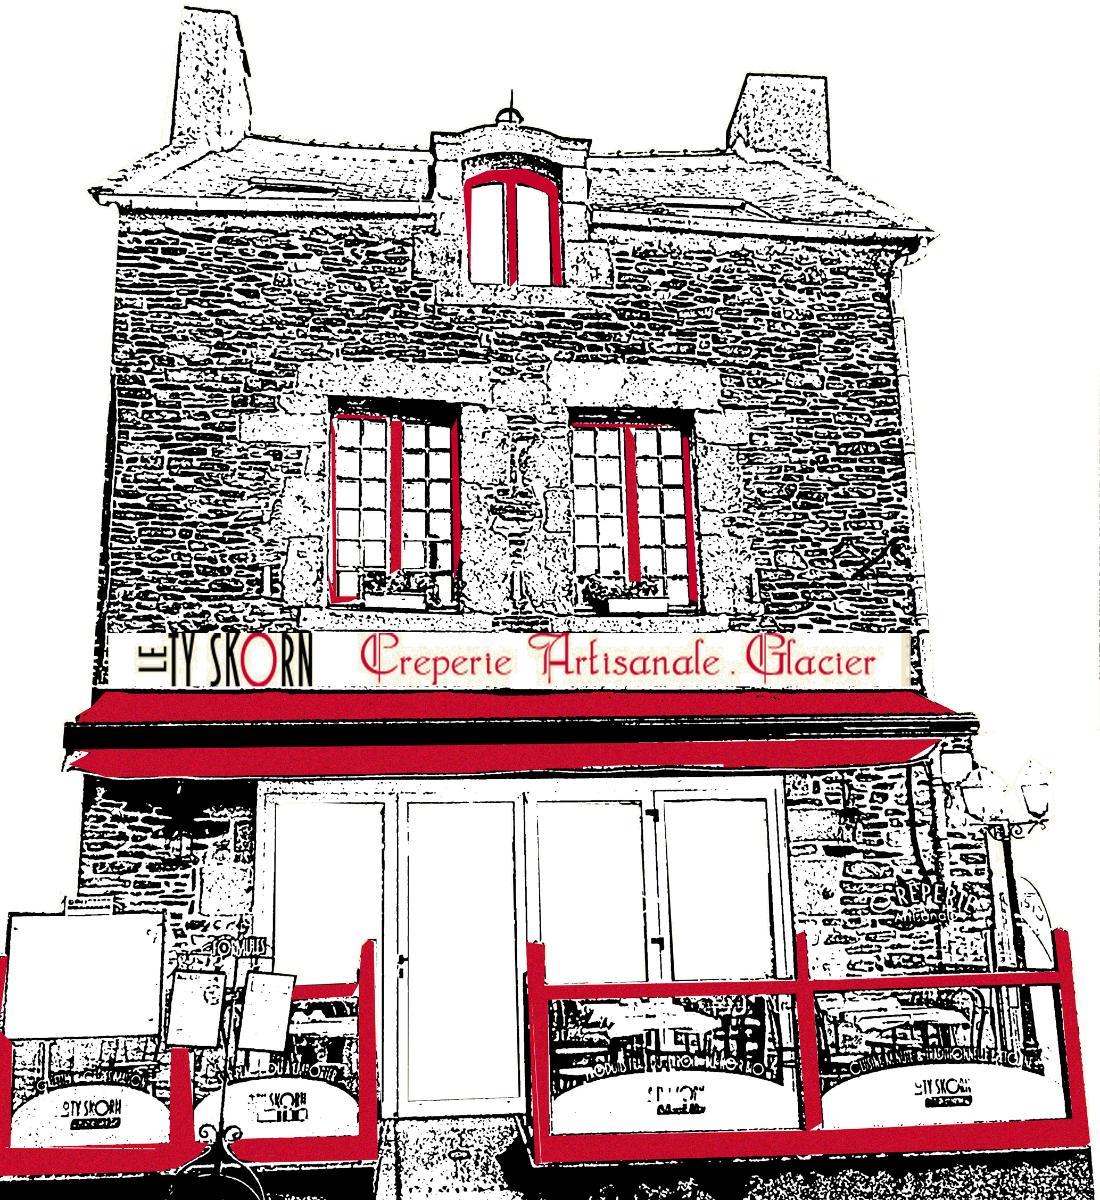 Businesse cards 2015 SMALL, Crêperie Restaurant Ty Skorn à Cancale, Ille-et-Vilaine (35)